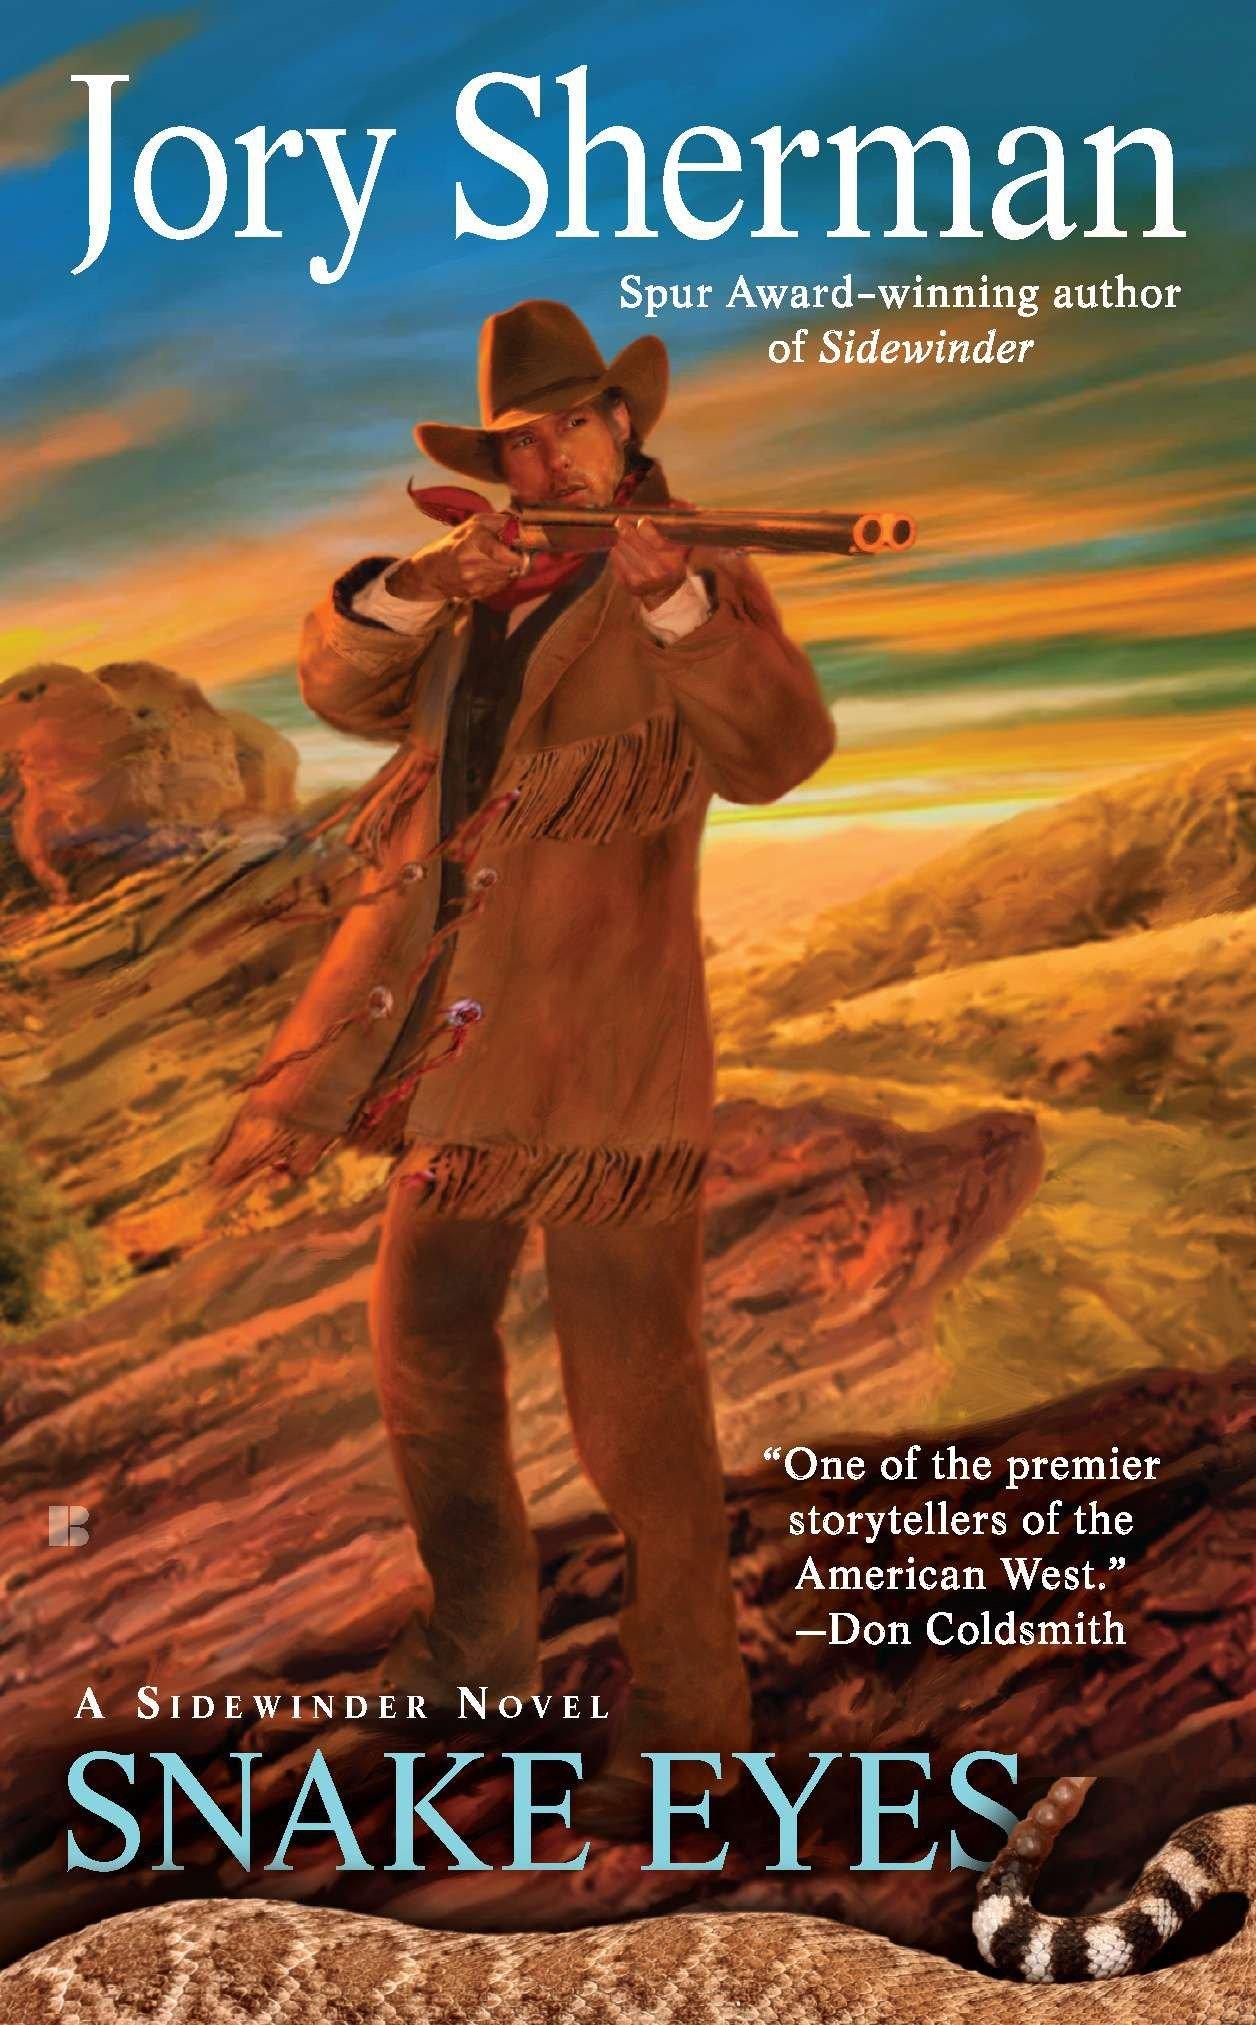 Snake Eyes (A Sidewinders Novel): Jory Sherman